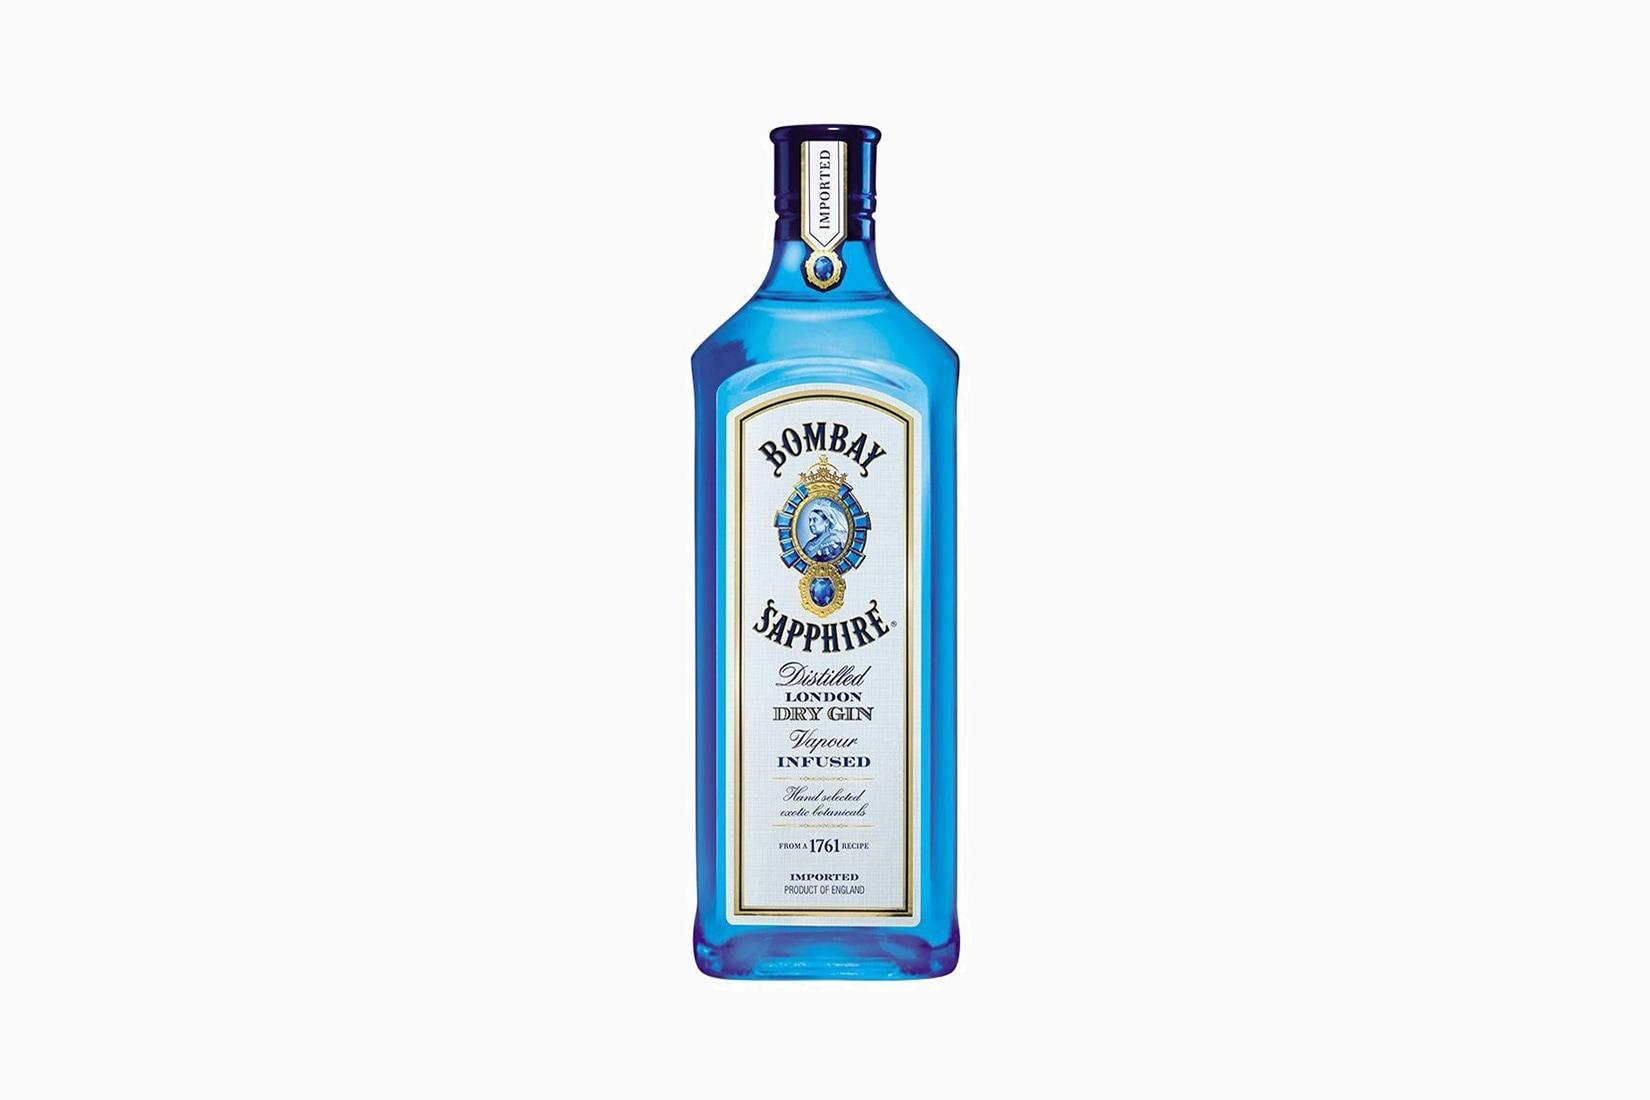 best gin brands value bombay sapphire - Luxe Digital